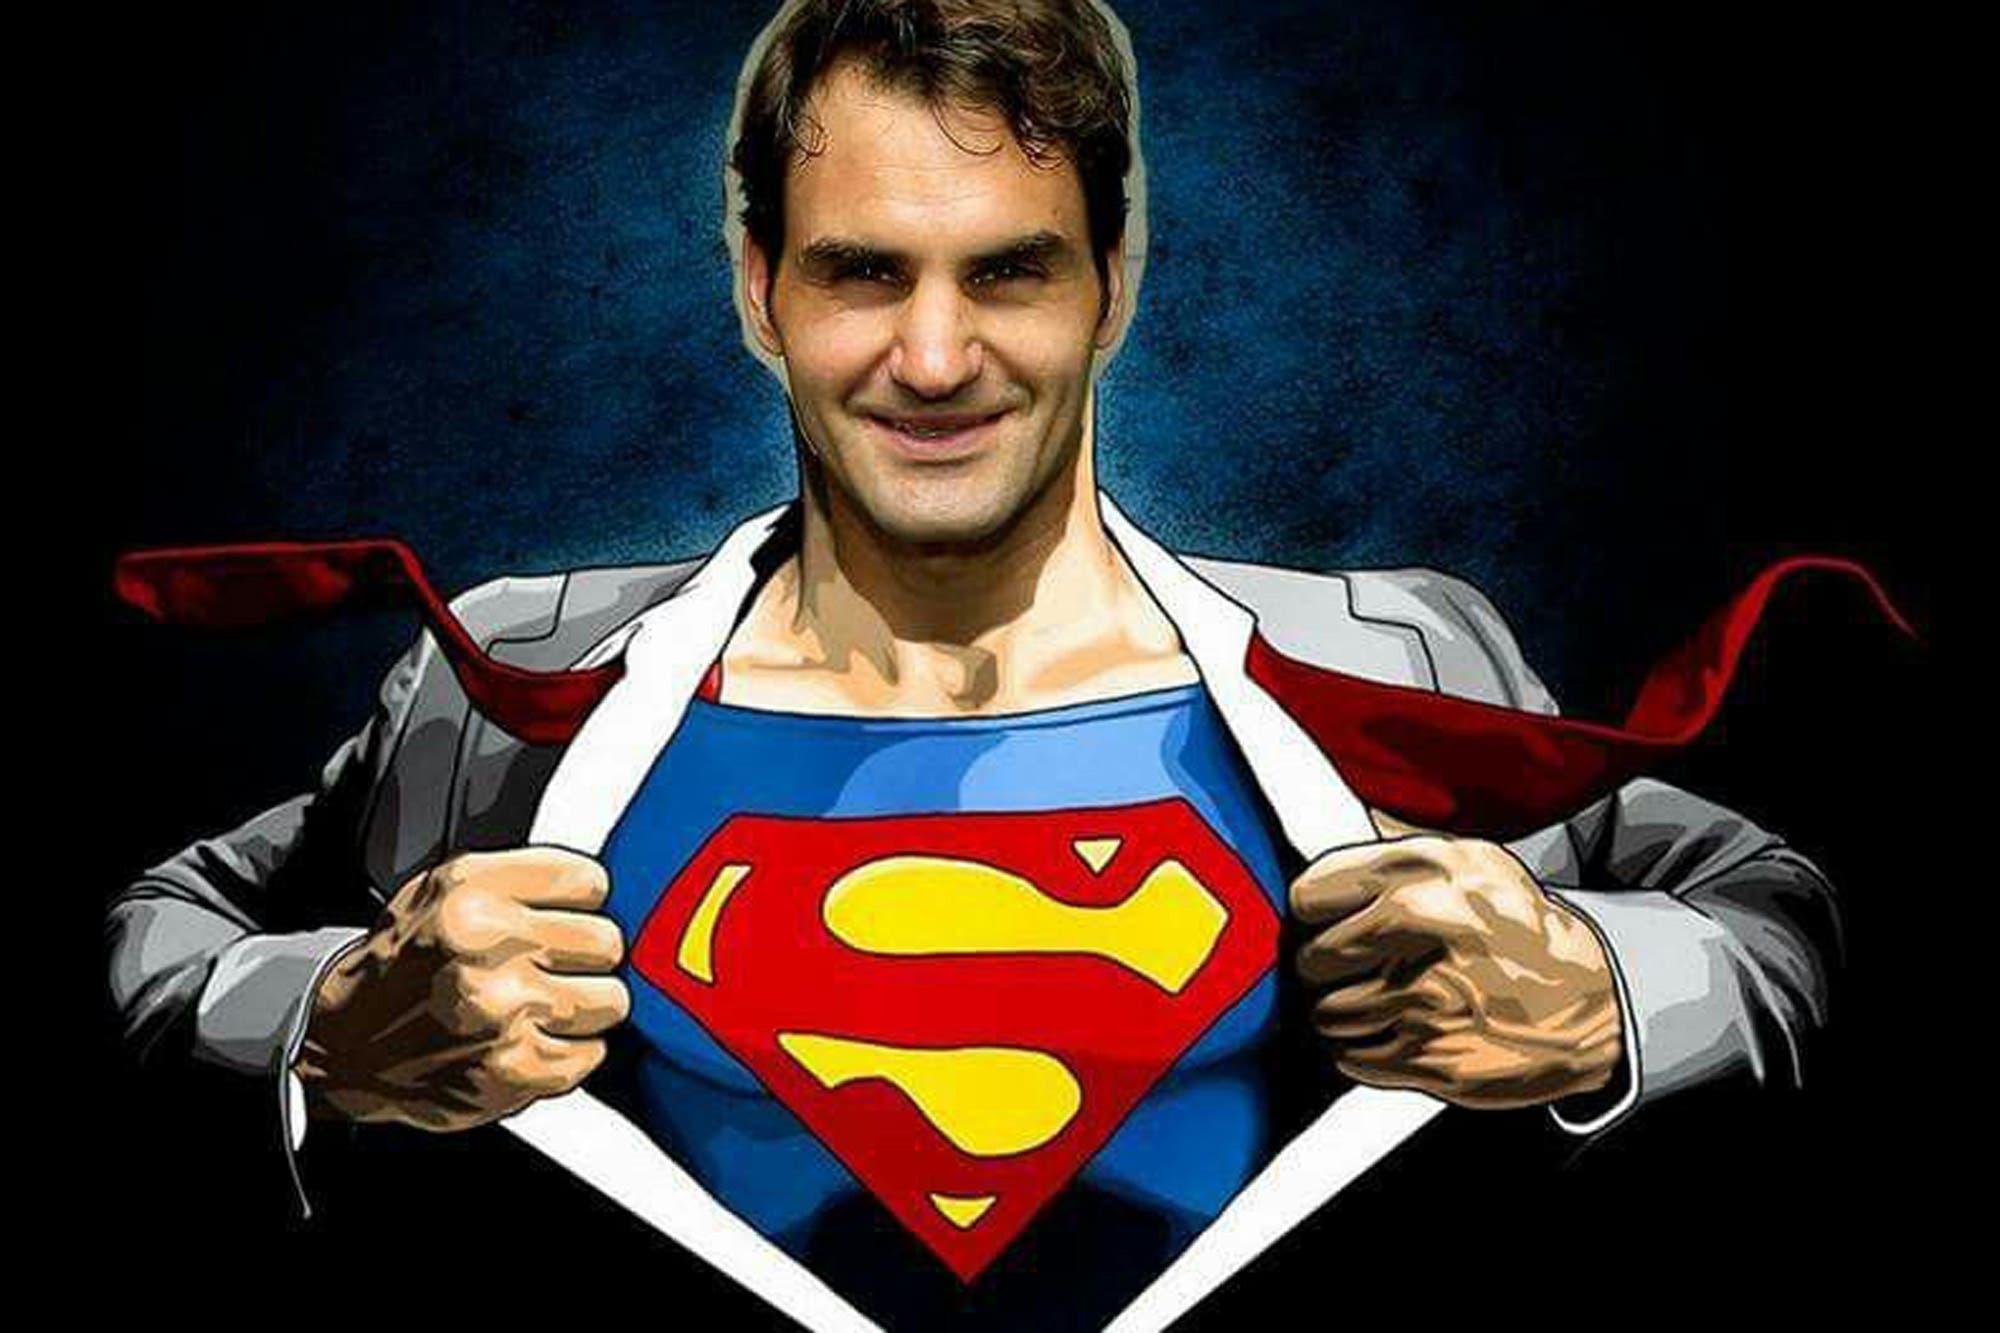 """Como Superman"": el mensaje de amor de Mirka a Roger Federer antes de la kriptonita de Djokovic"